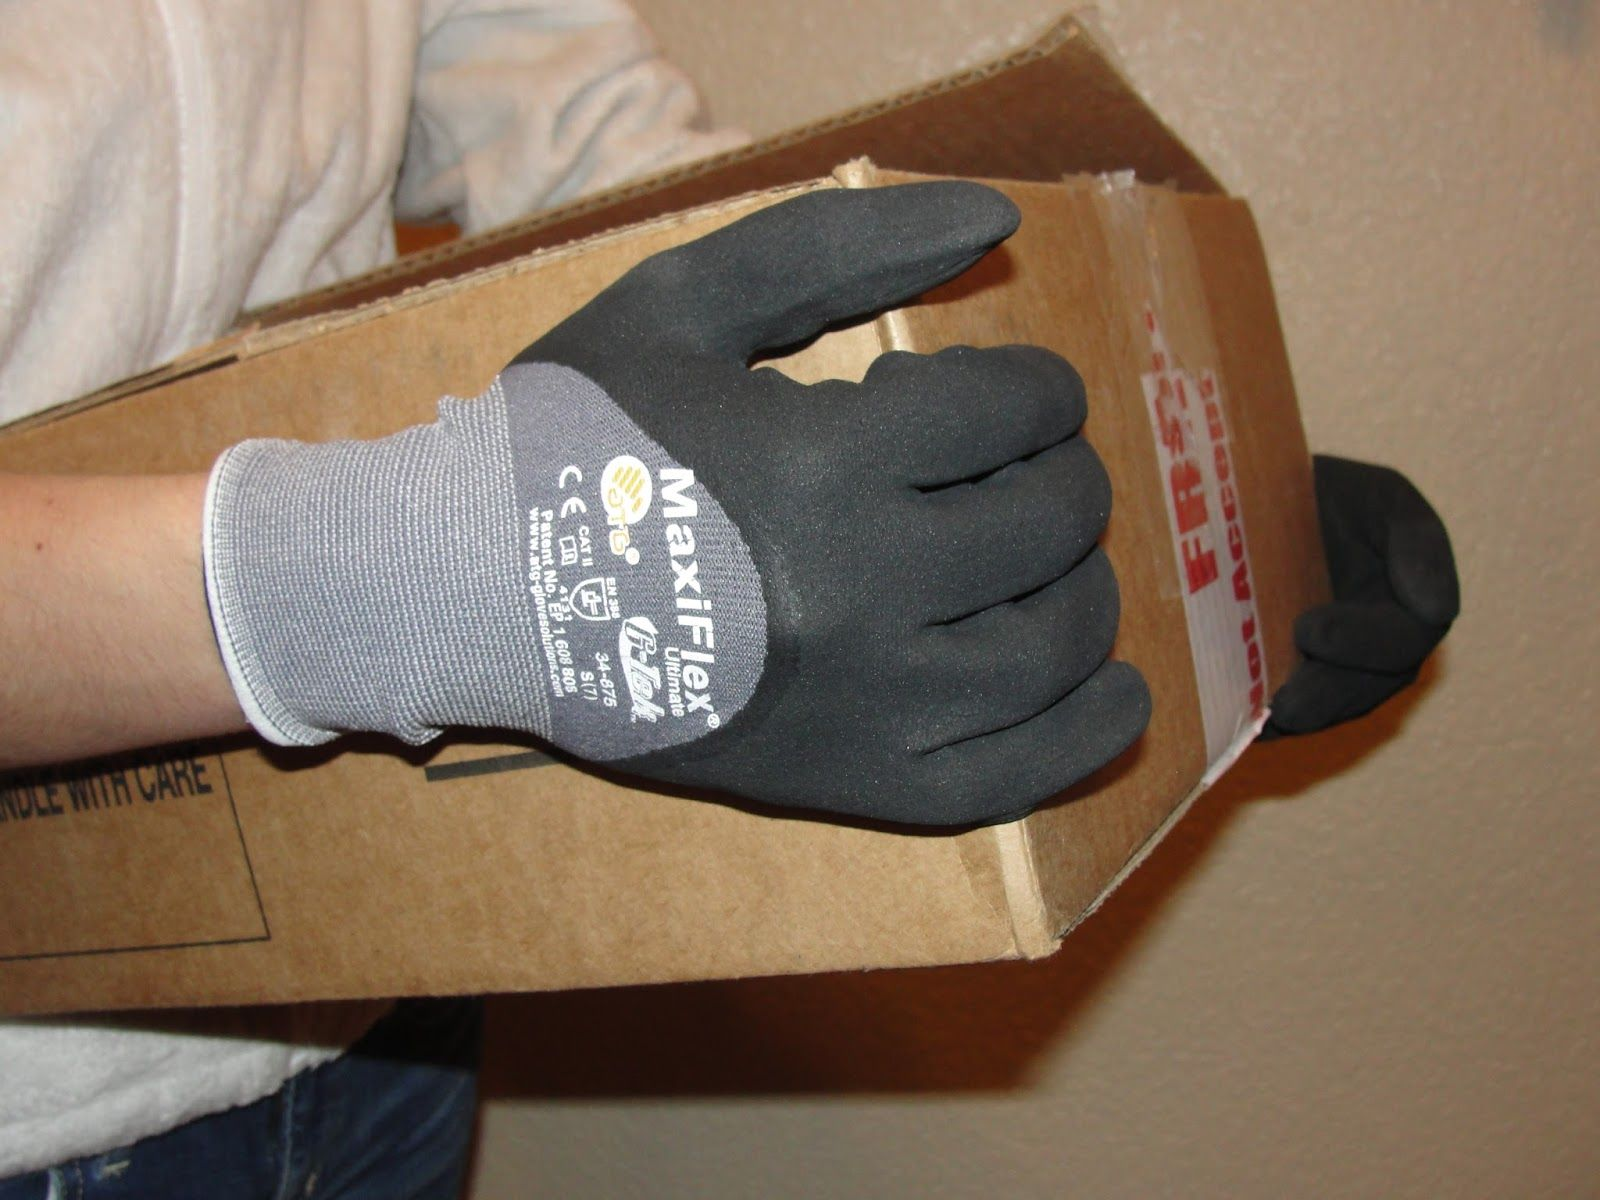 Diy duet: friday favorites 2 21 14 maxiflex gloves diyduets